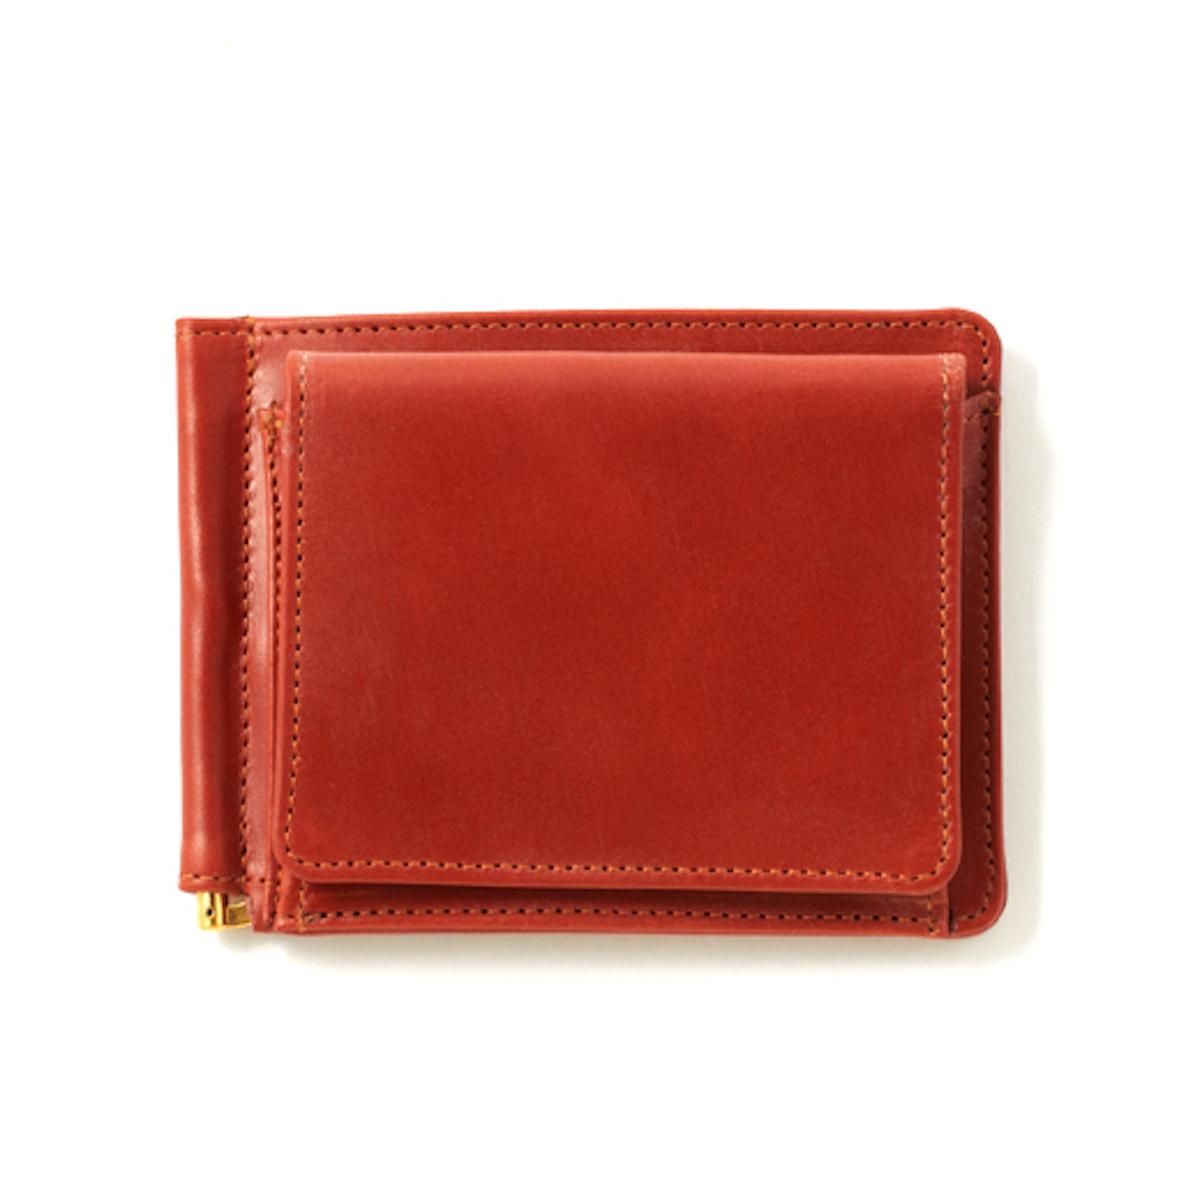 GLENROYAL / MONEY CLIP WITH COIN POCKET -OXFORD TAN